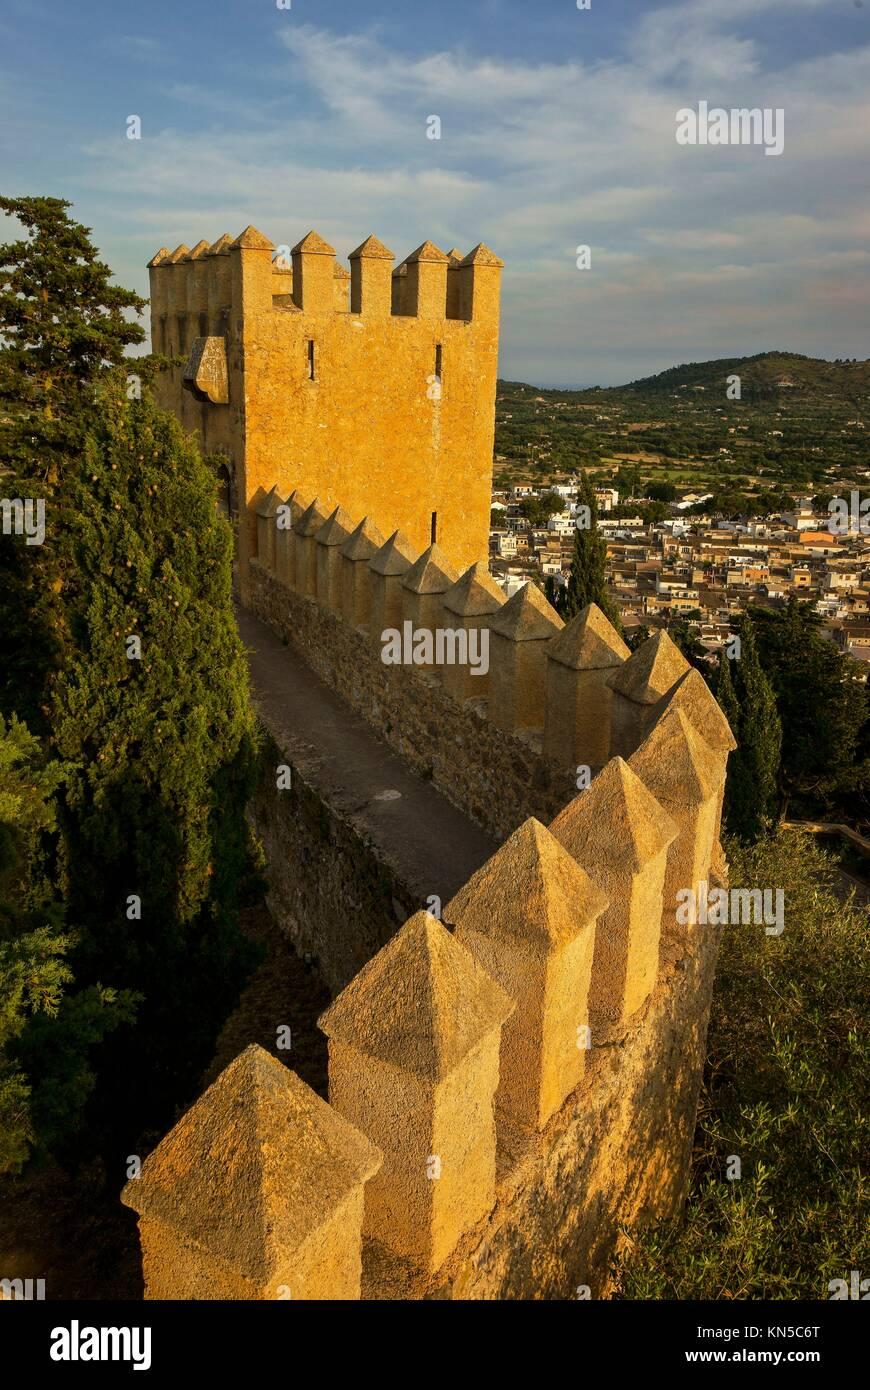 Torre de Sant Miquel, Sant Salvador de S´Almudaina, XIV. Arta. Mallorca century. Balearic Islands. Spain. - Stock Image